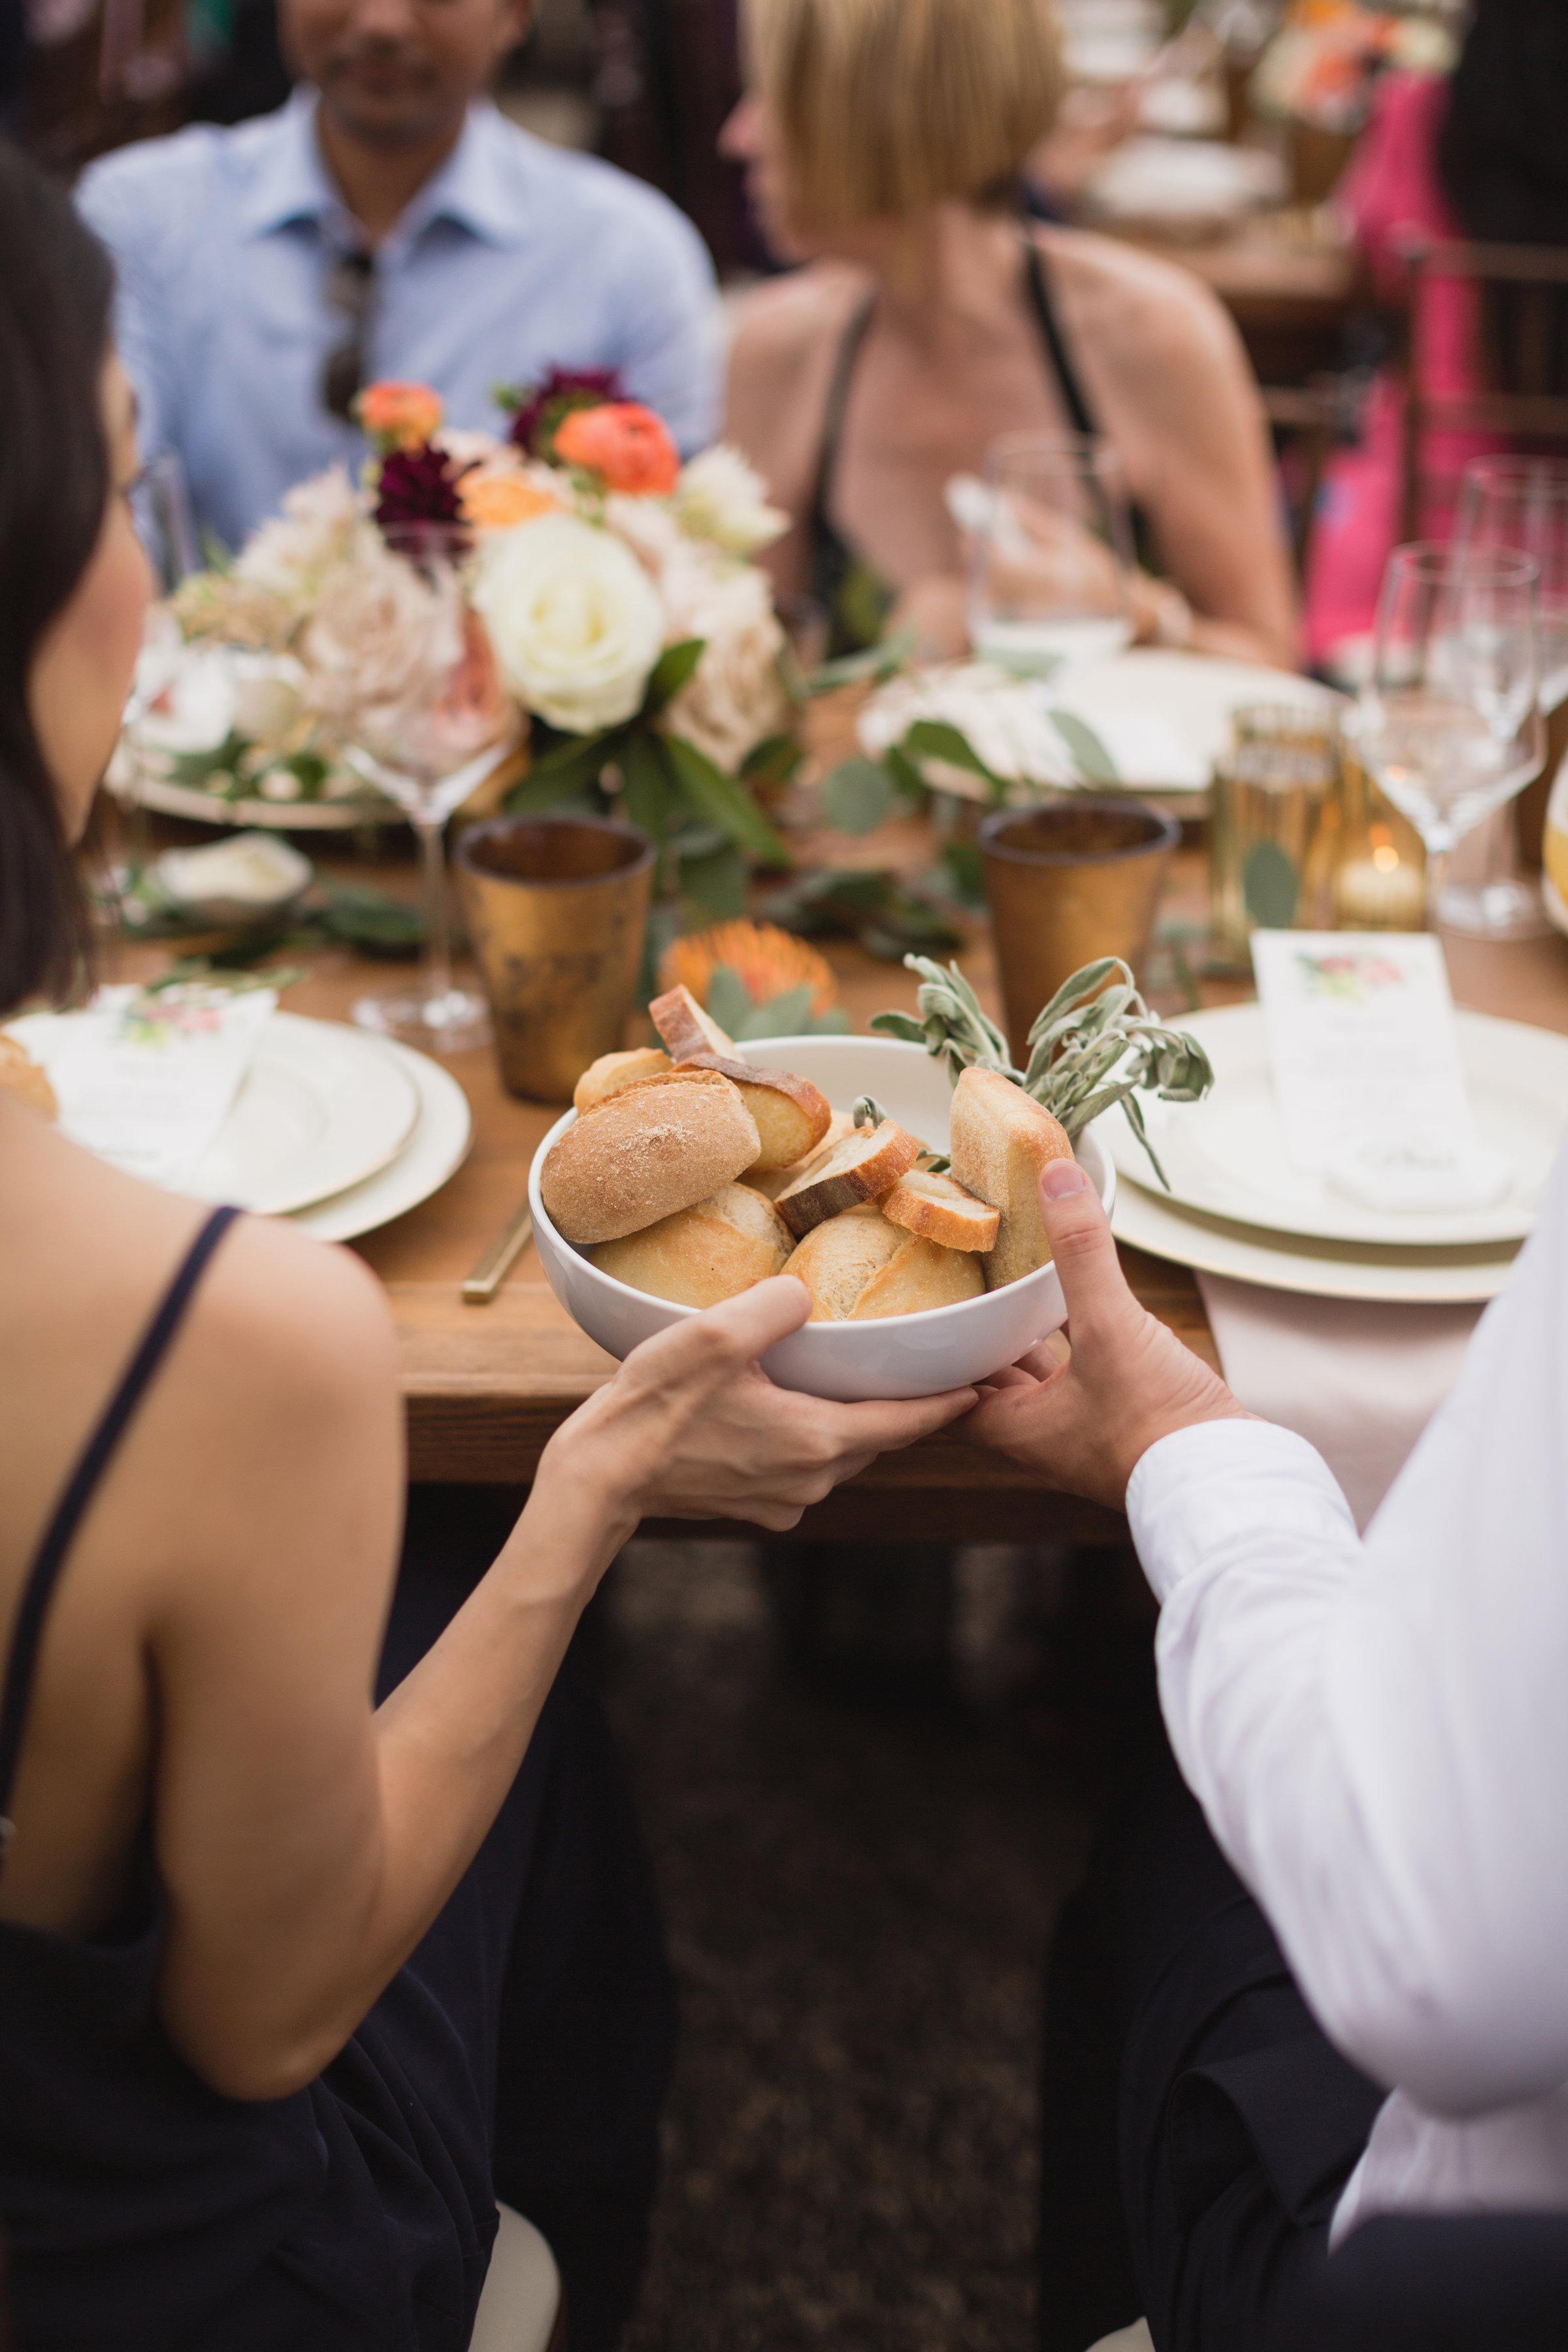 california indian jewish wedding dinner guests sharing bread